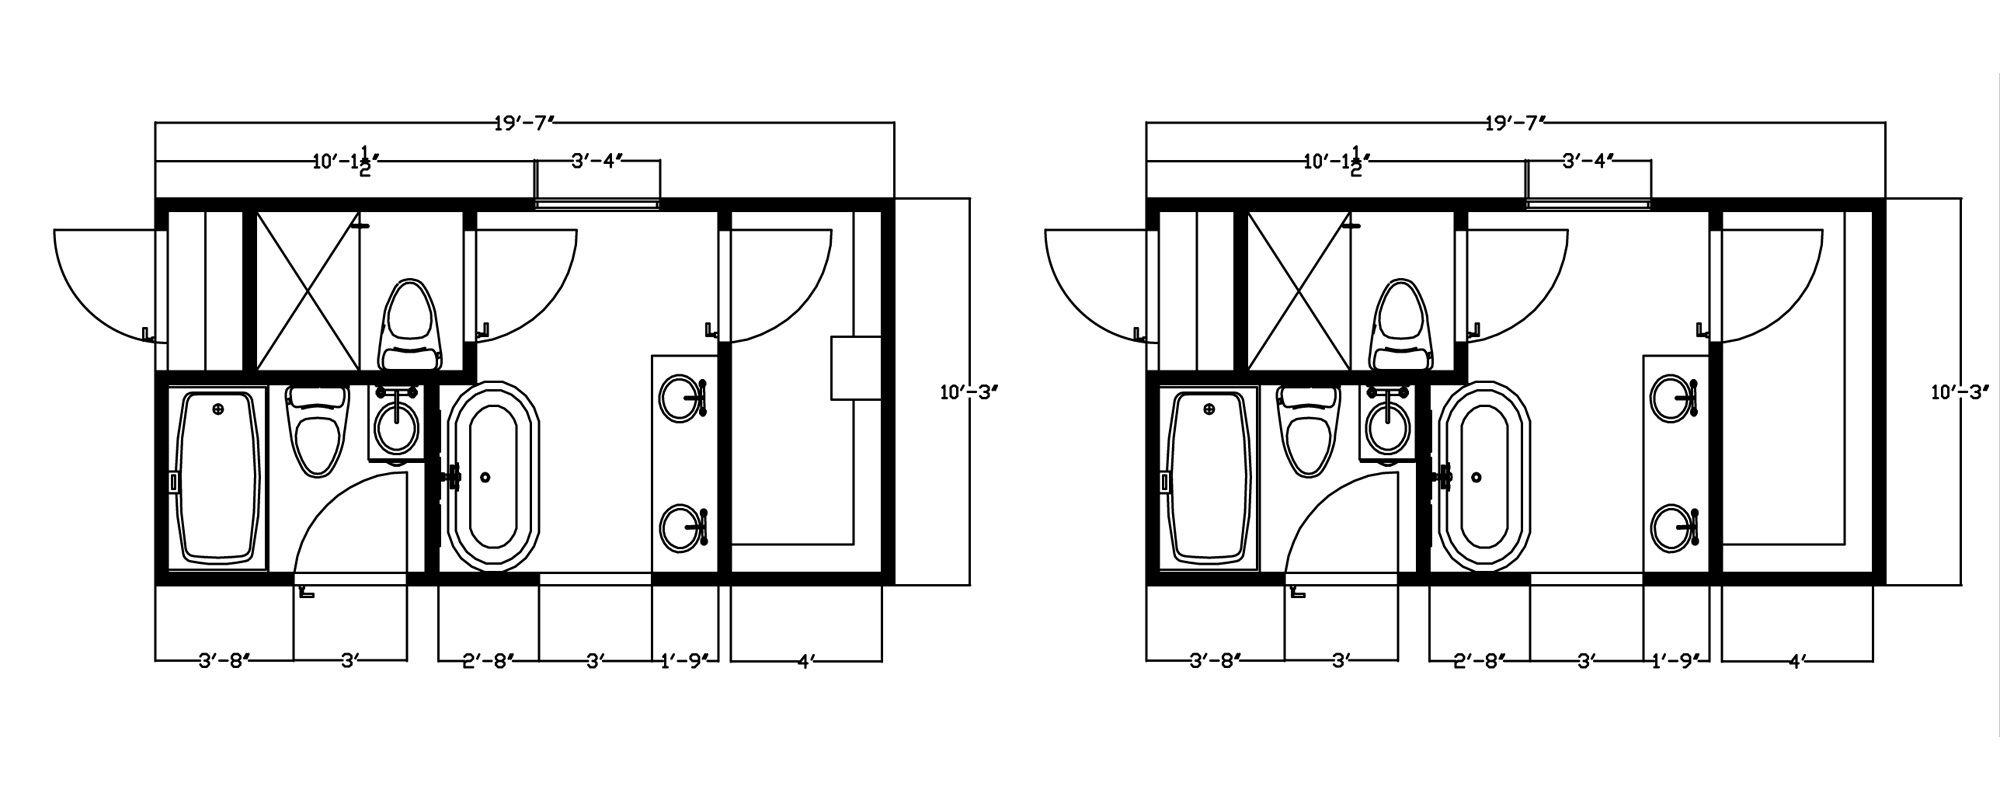 10X12 Master Bath Floor Plans